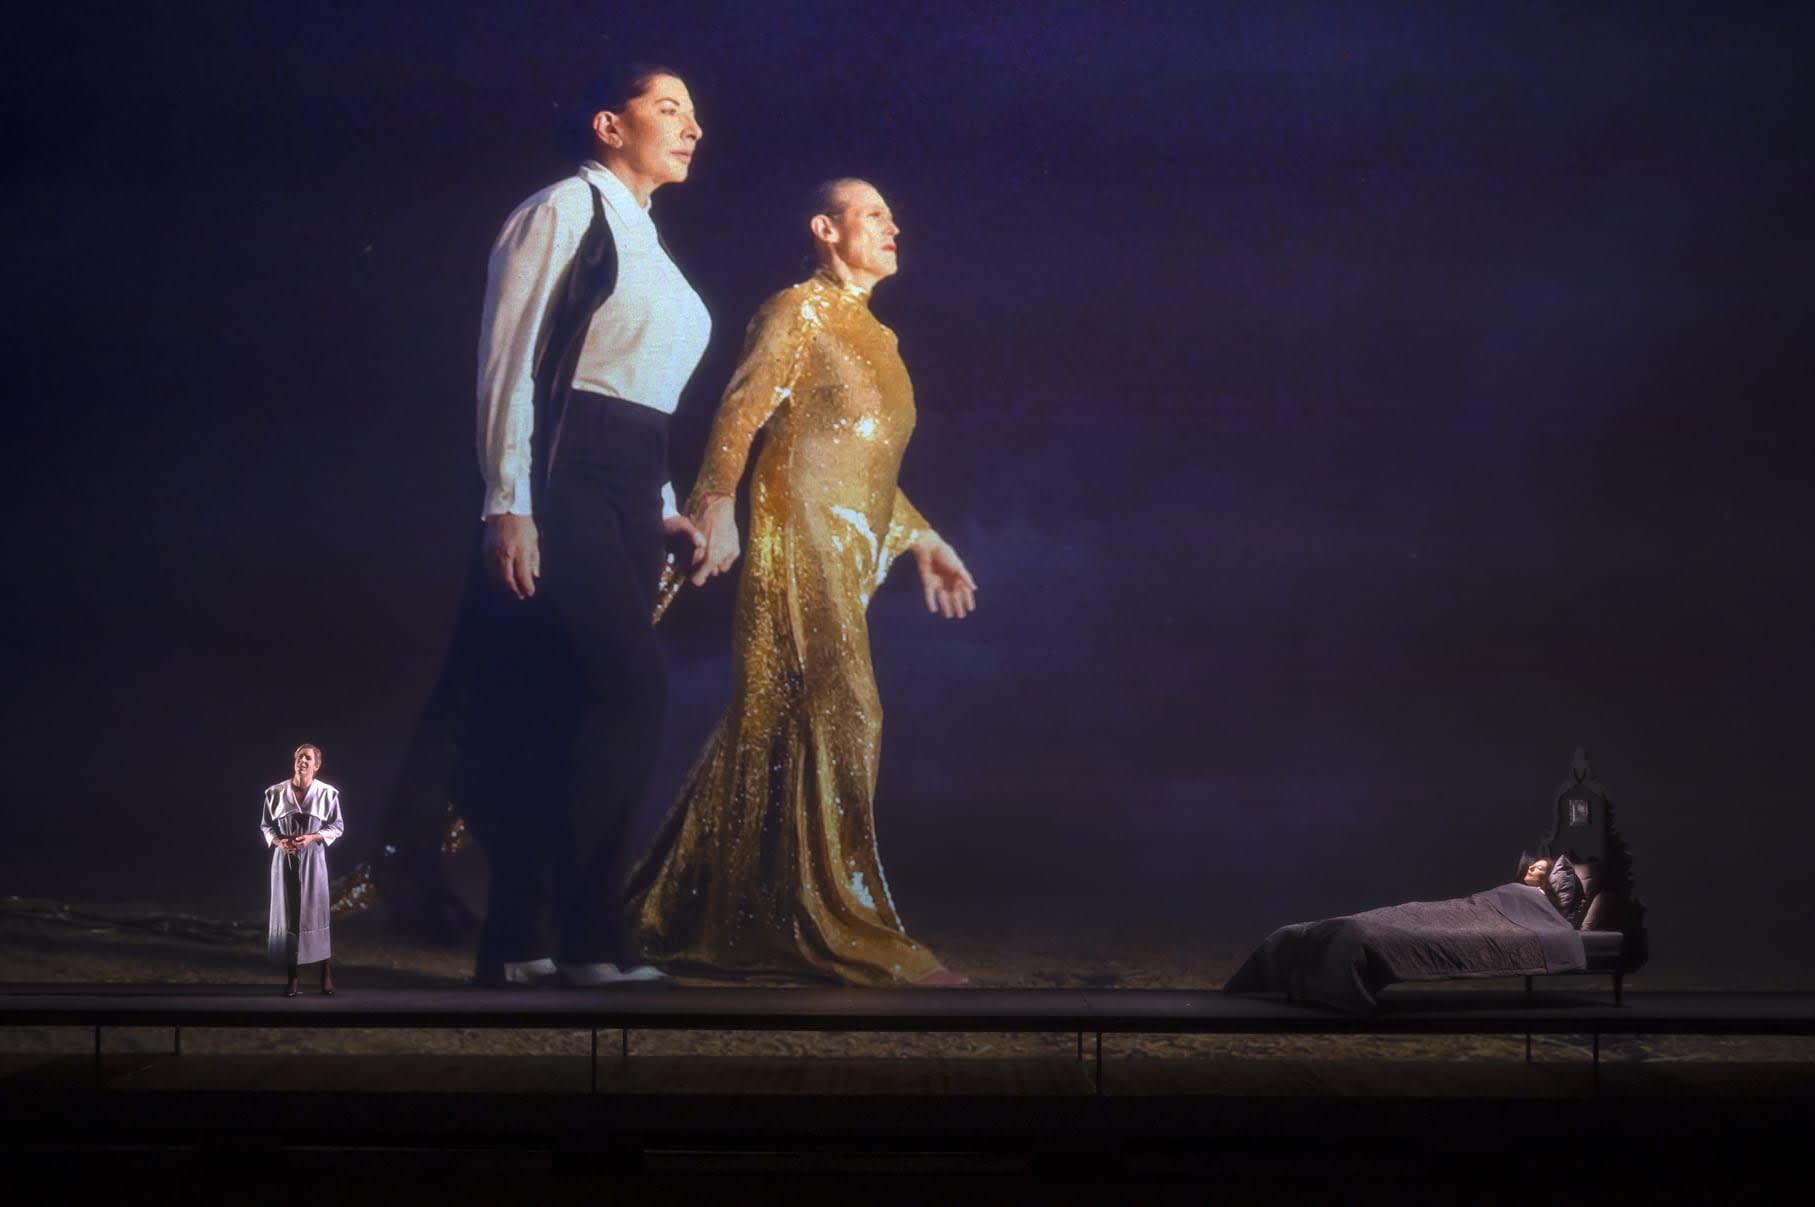 7 Deaths of Maria Callas 21-22 © Charles Duprat - OnP (8)